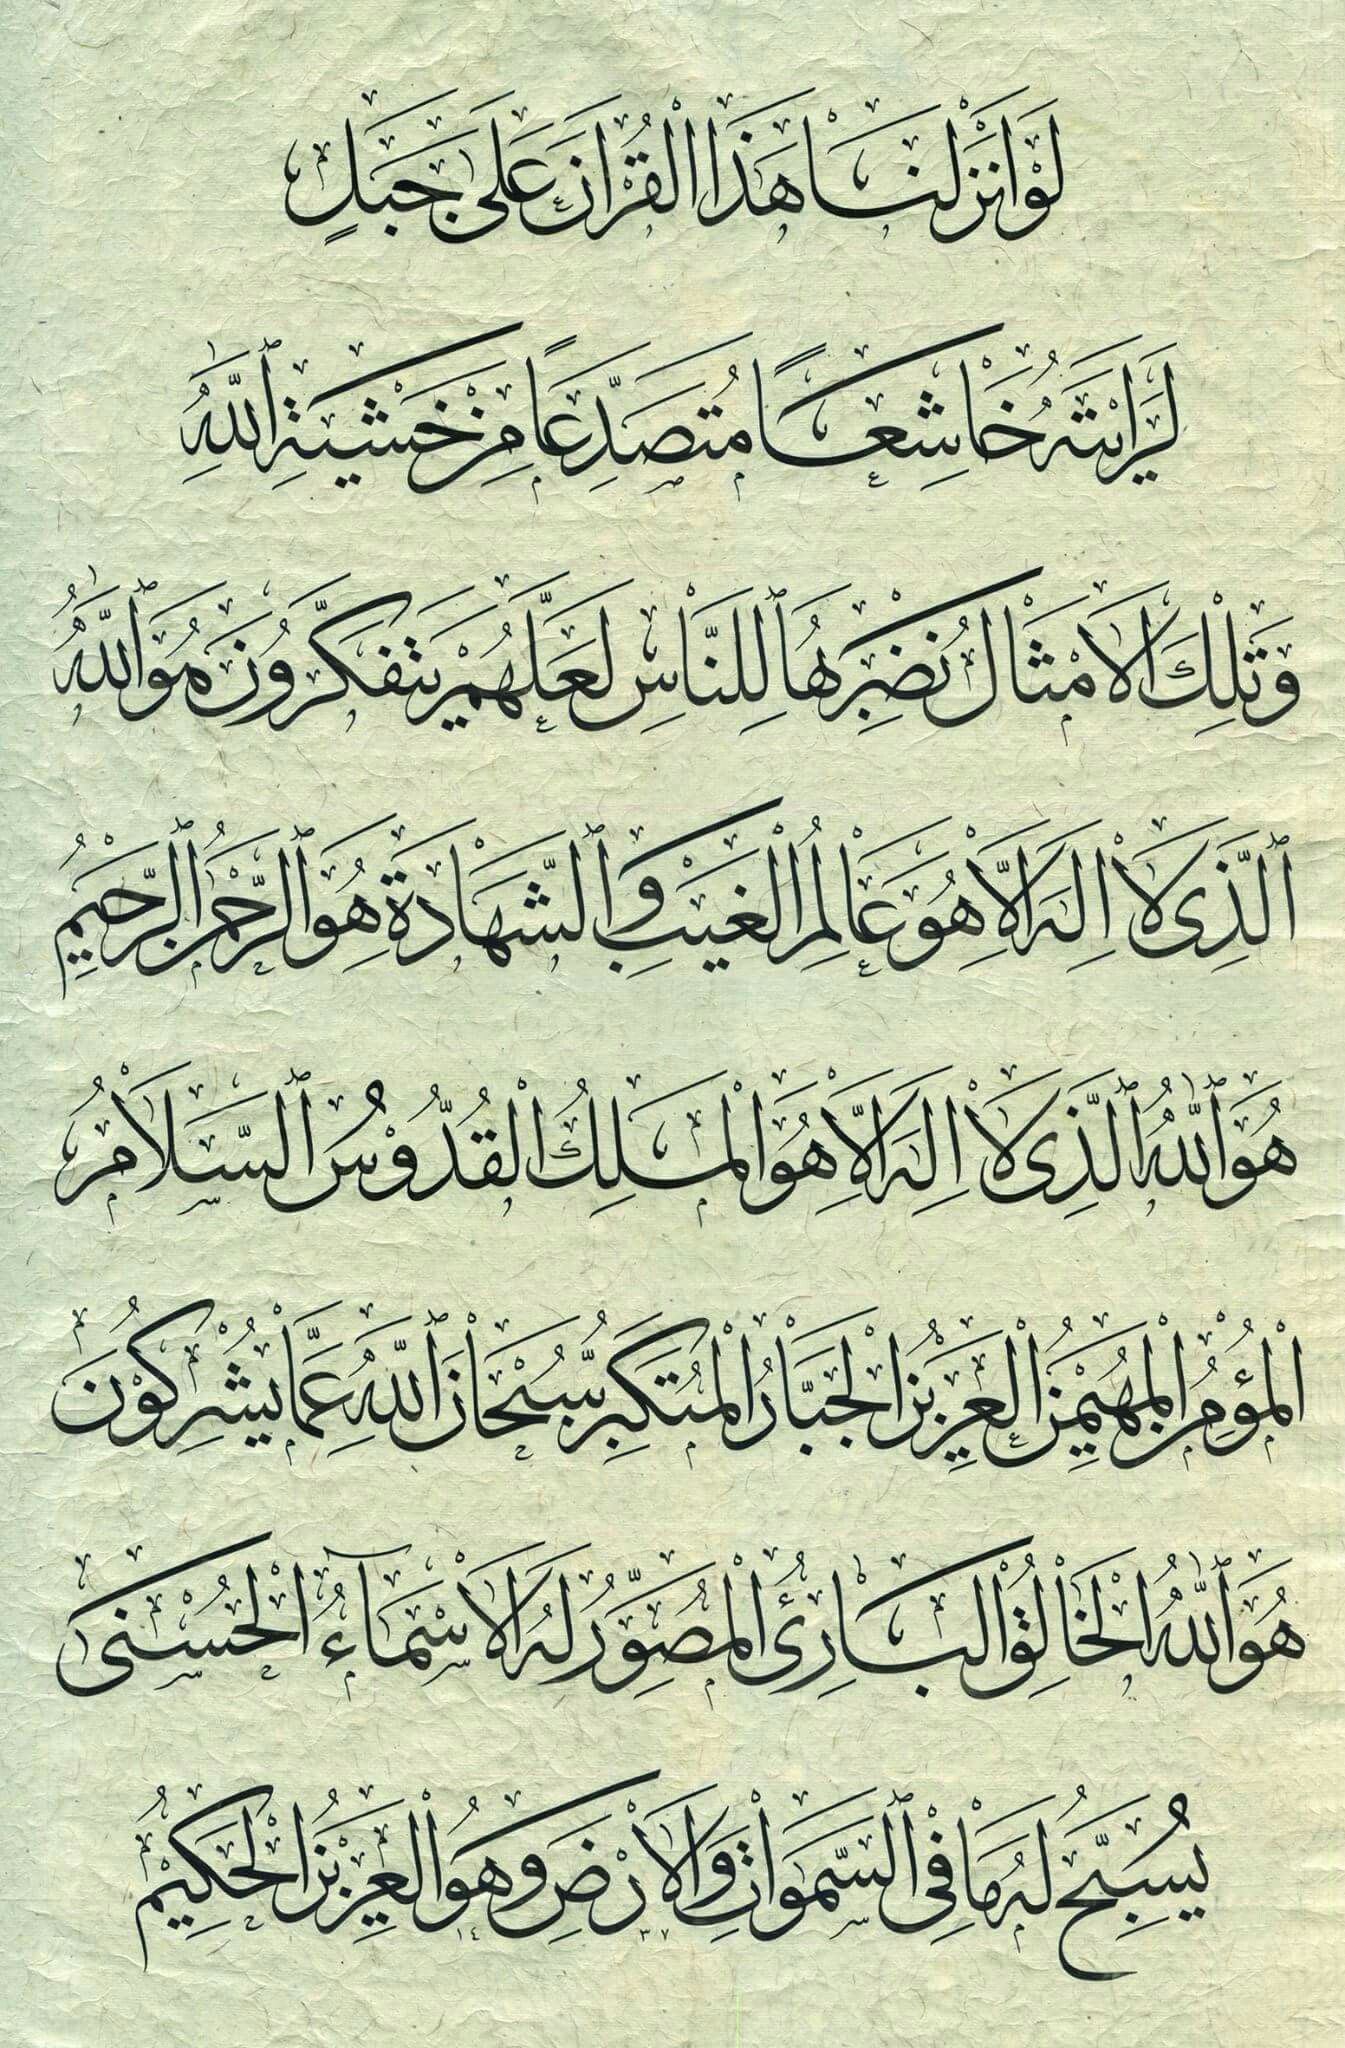 Pin By Abdullah Bulum On آخر سورة الحشر Sheet Music Calligraphy